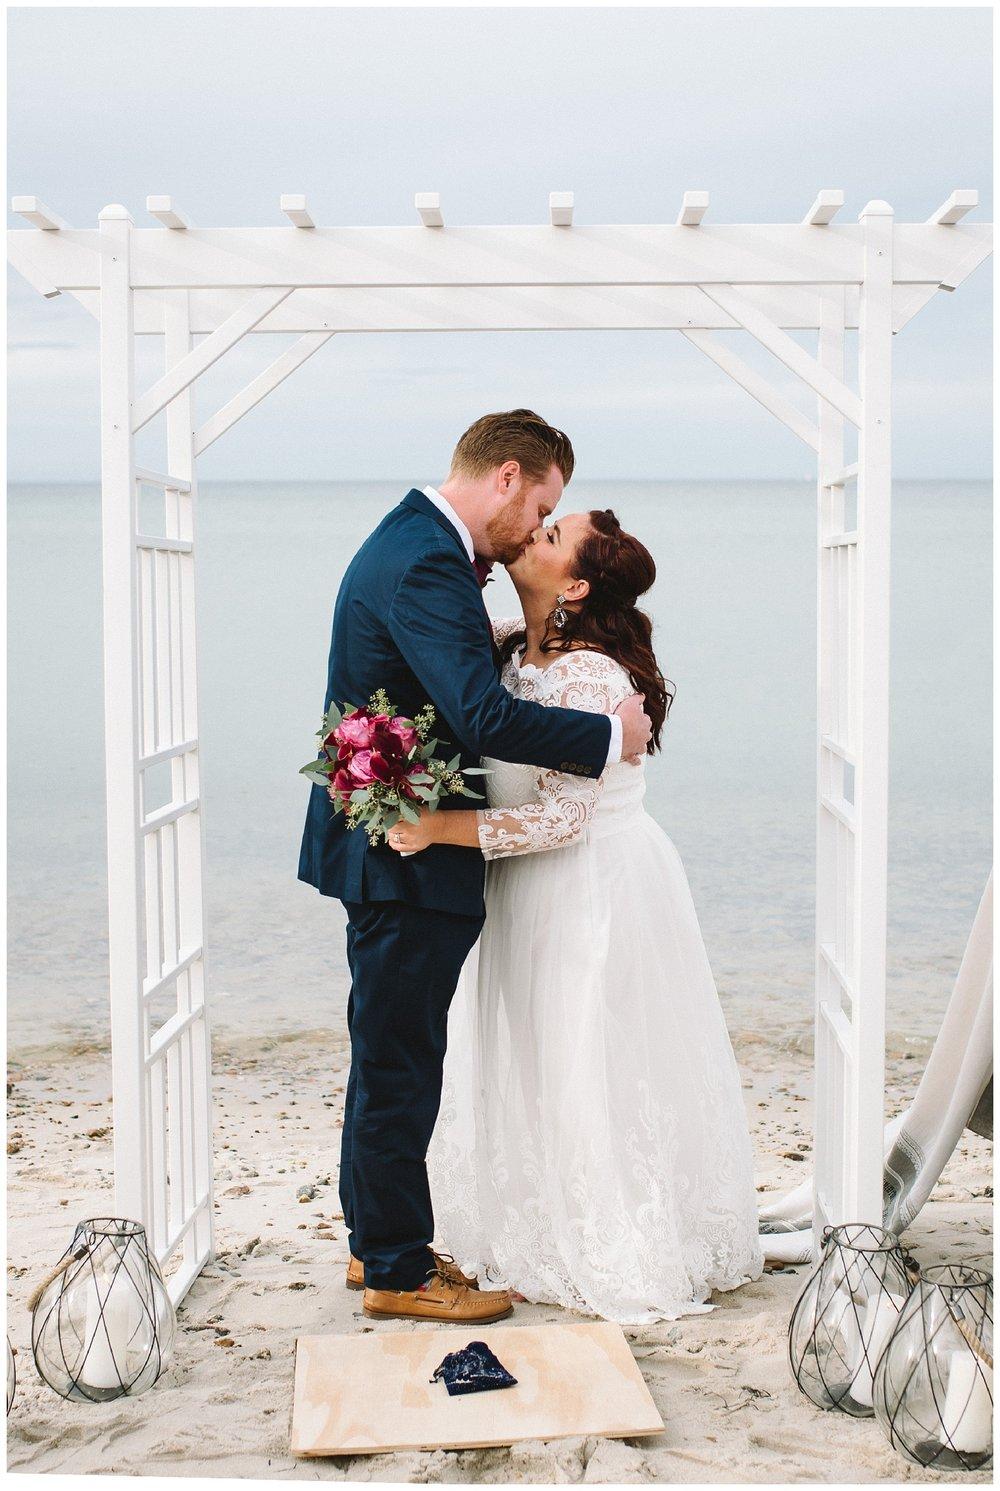 Intimate Beach Wedding Cape Cod Wedding Photographer Yarmouth MA-90.jpg